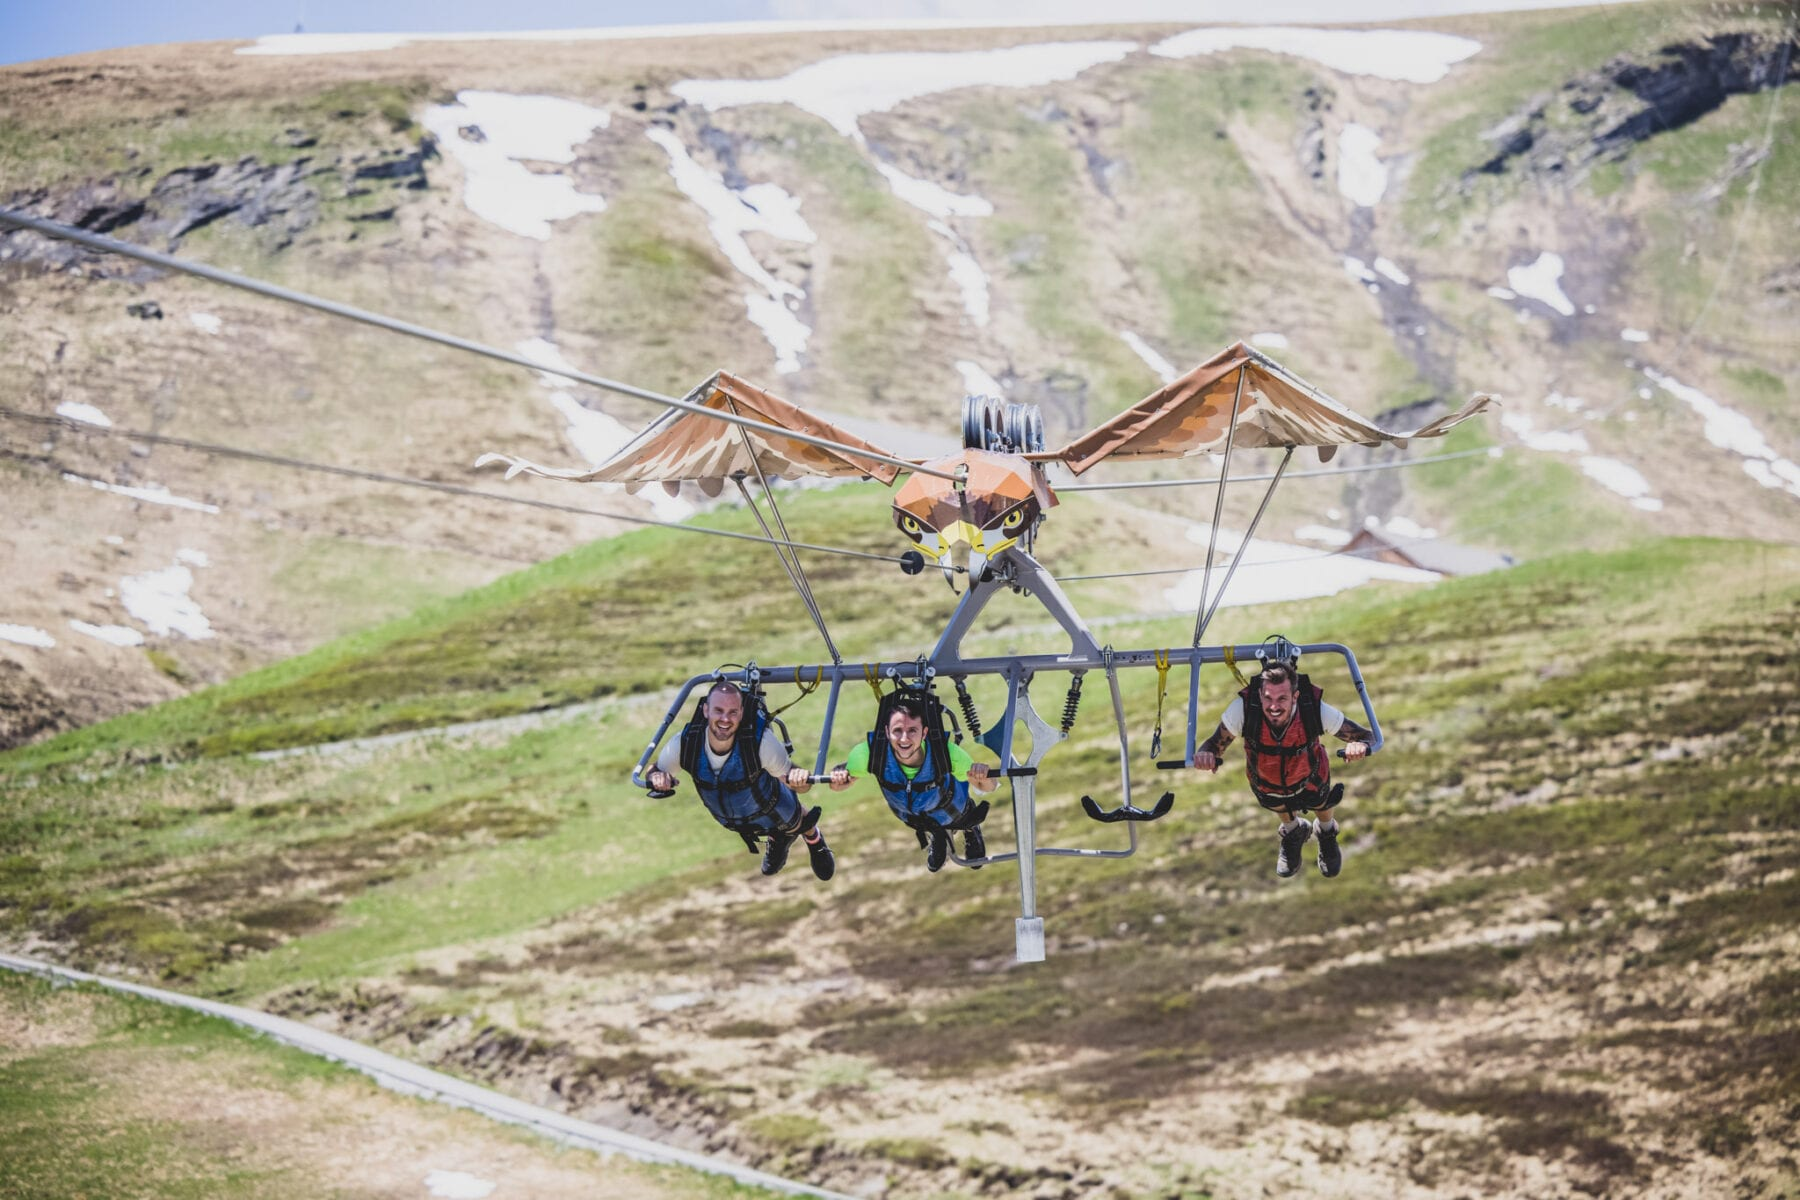 Jungfrau Grindelwald First Flyer Glider